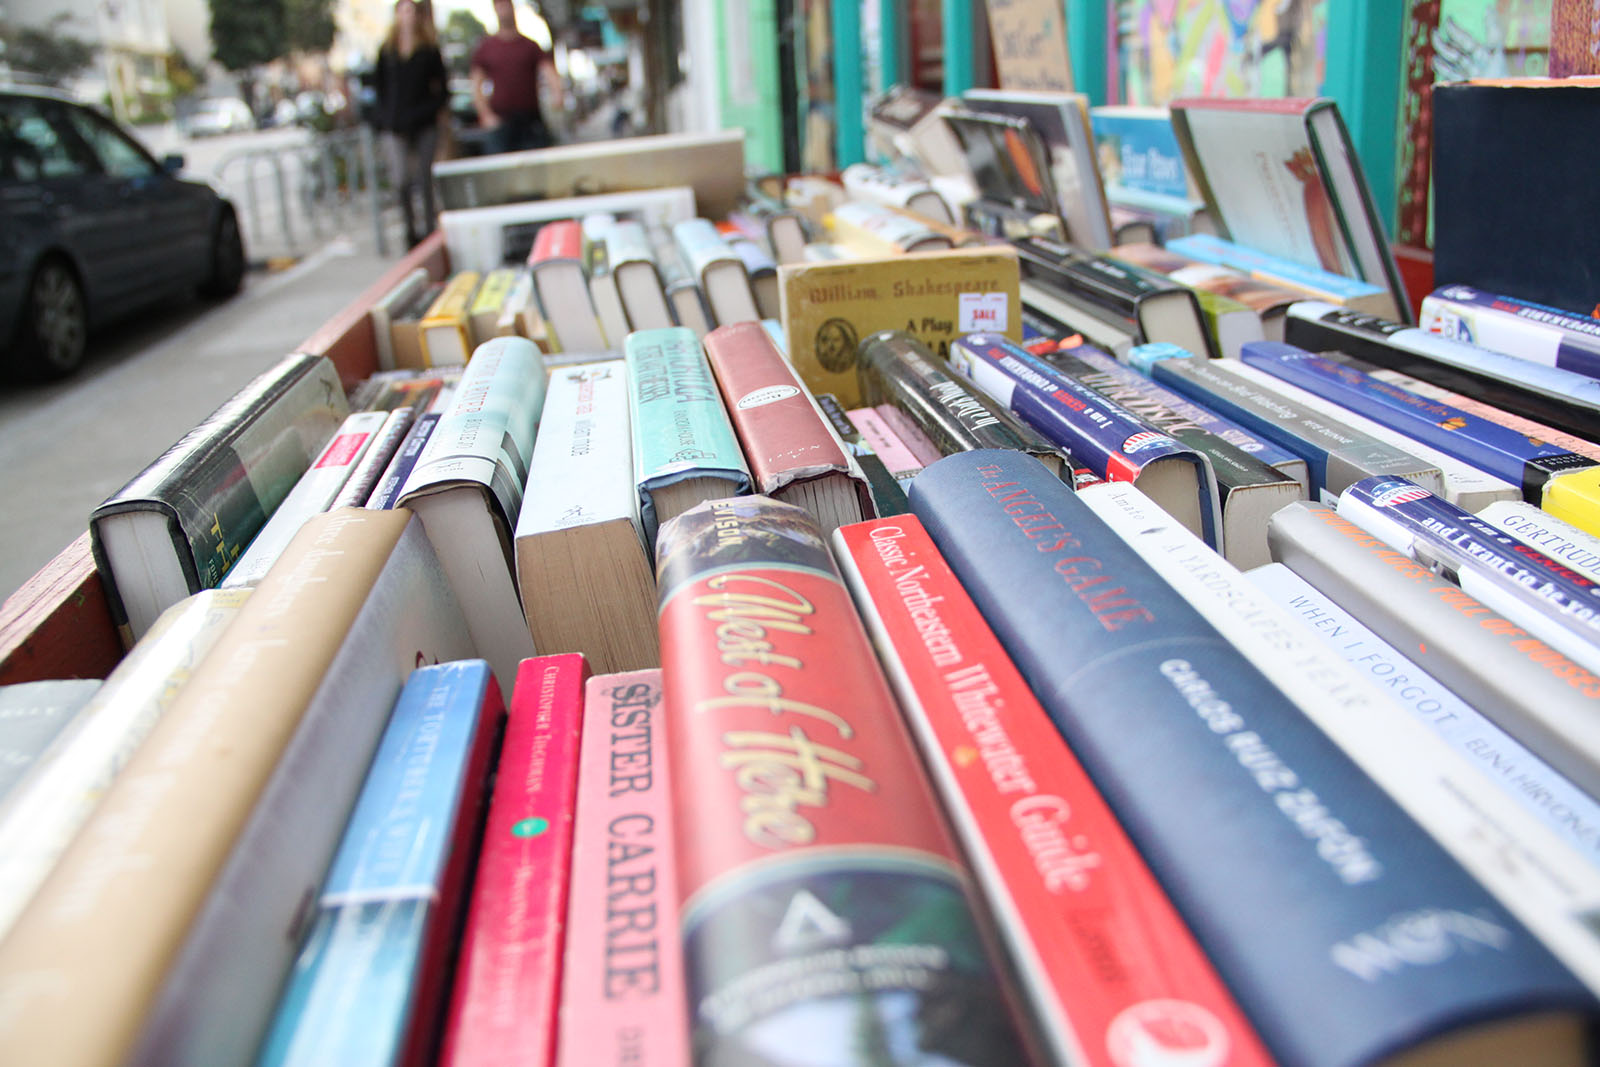 SNAP: Books on Valencia